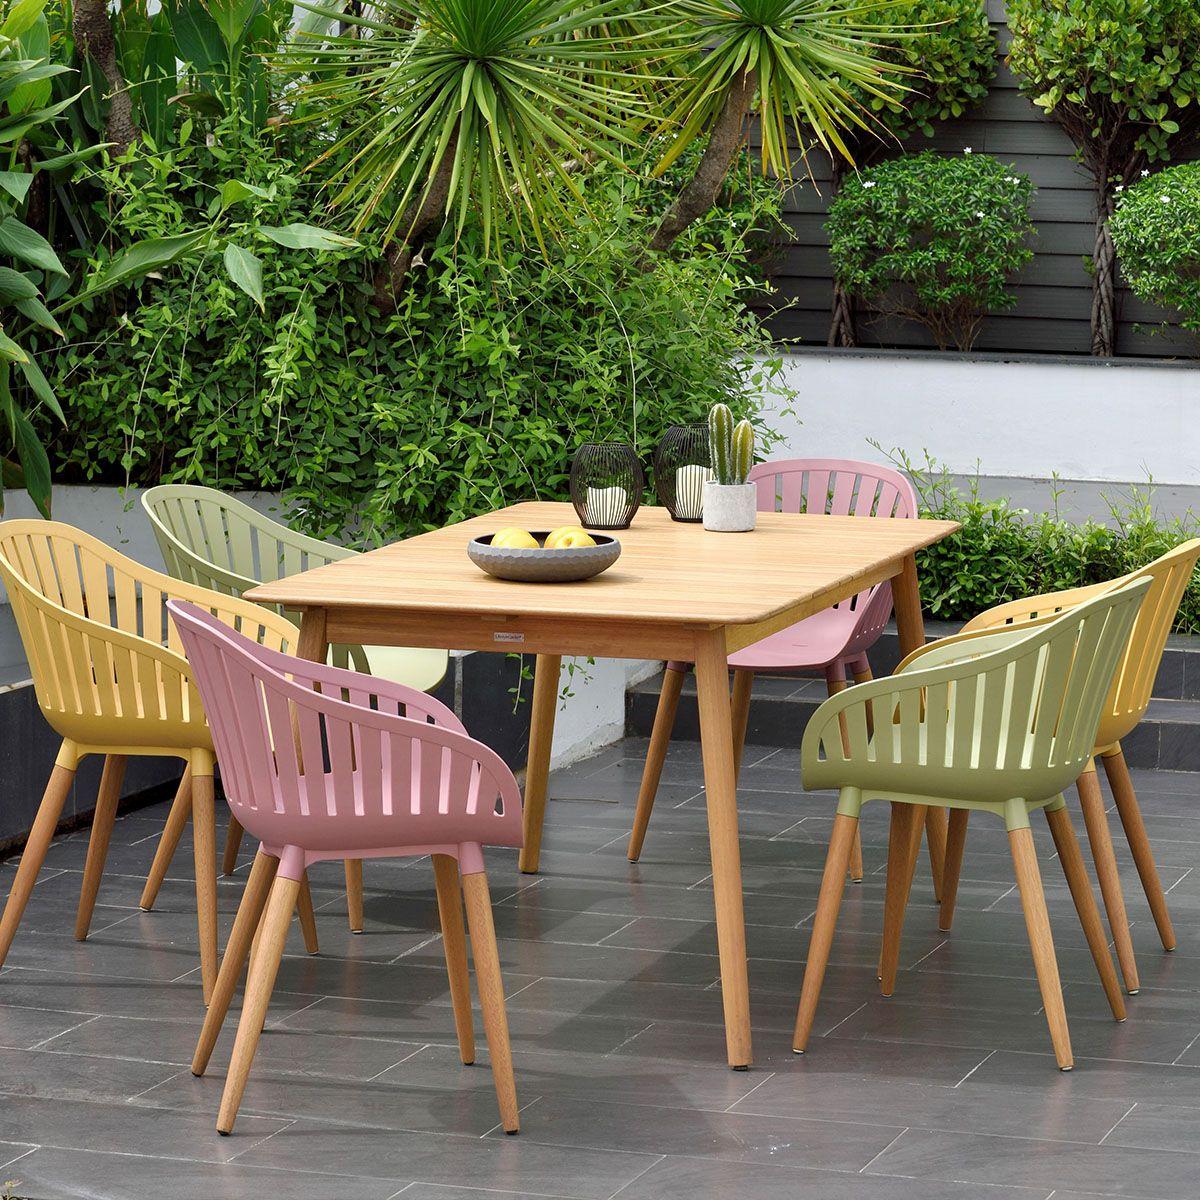 Gartensessel In Holz Kunststoff Weiss Teakfarben In 2020